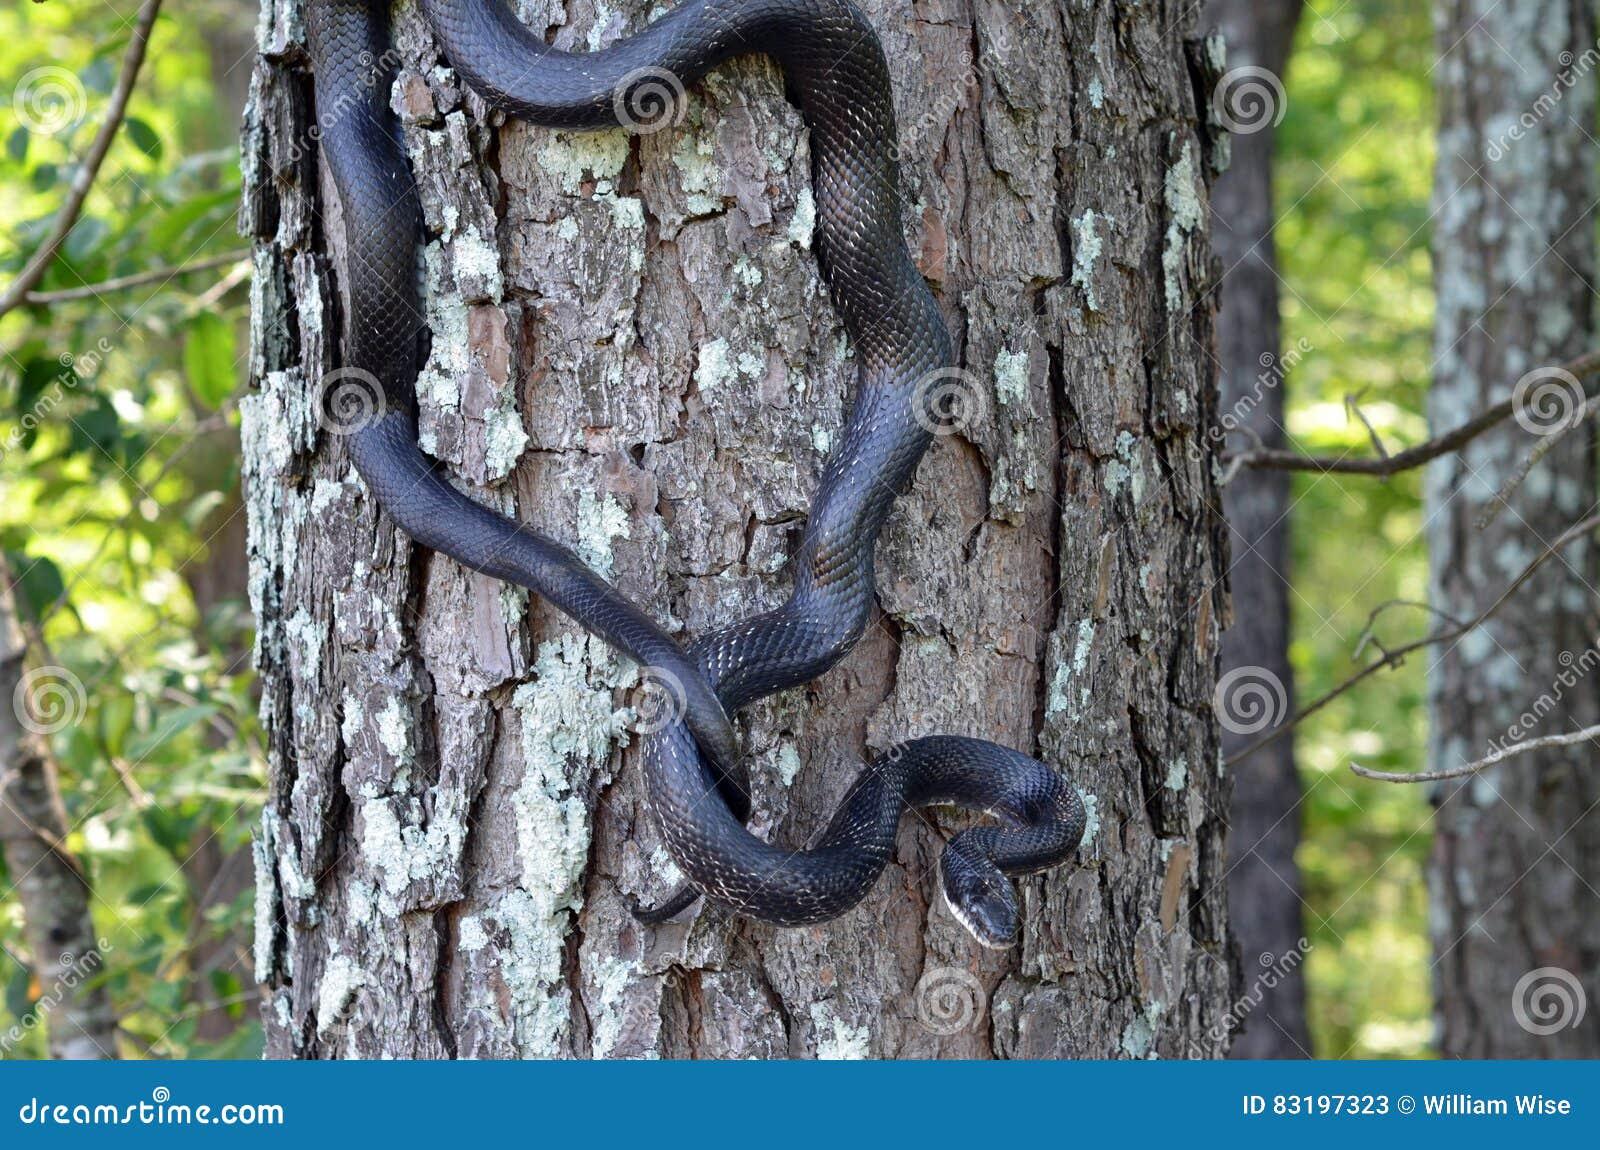 Black Rat Snake Climbing Tree Stock Image - Image of shed